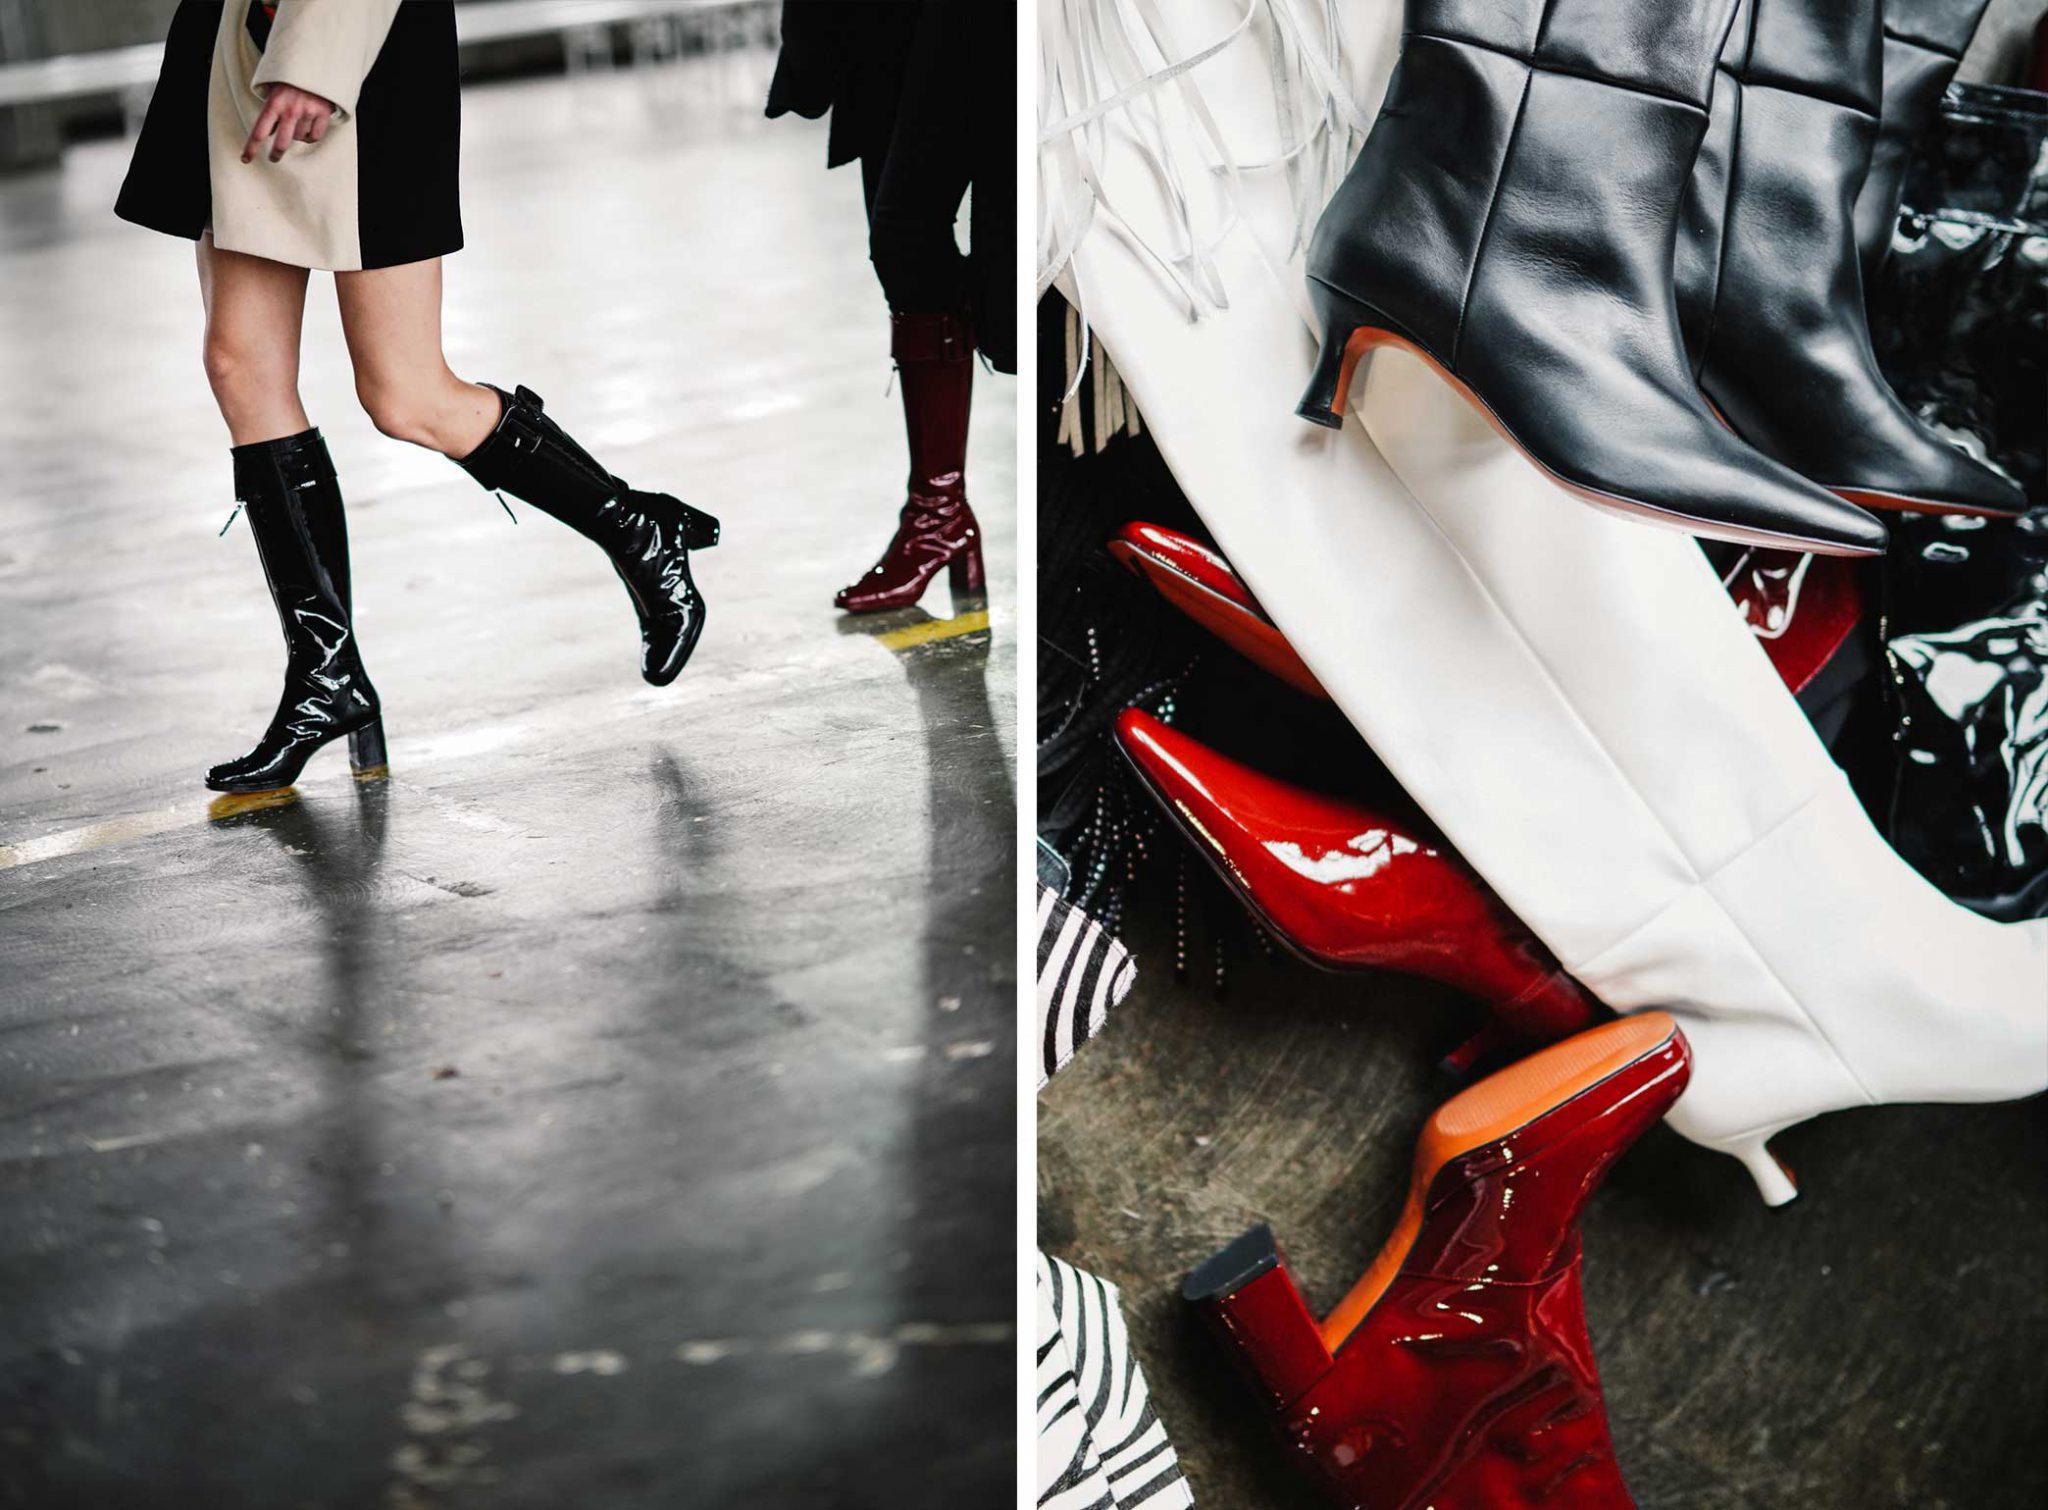 Ilsoo_van_Dijk_Ilsoovandijk_AFW_Toral_Backstage_Amsterdam_Fashion_week_2020_-scaled_14